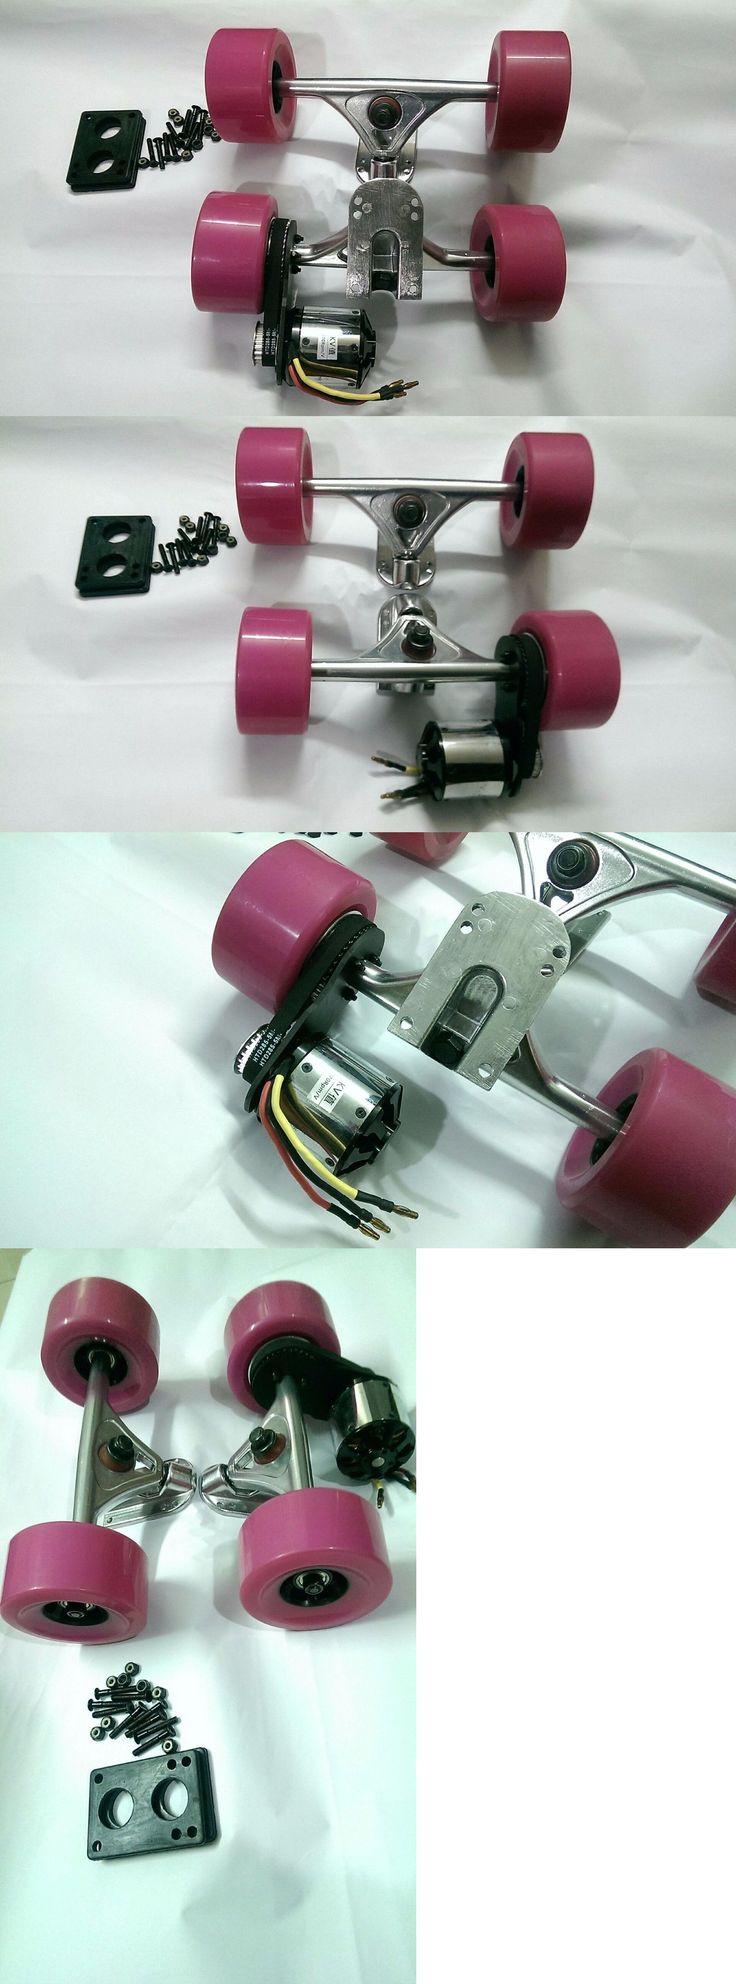 Other Skateboard Parts 159076: Diy 2900W Electric Longboard Parts Drive Kit 97Mm Wheel 8Truck C6374 Motor -> BUY IT NOW ONLY: $130.0 on eBay!